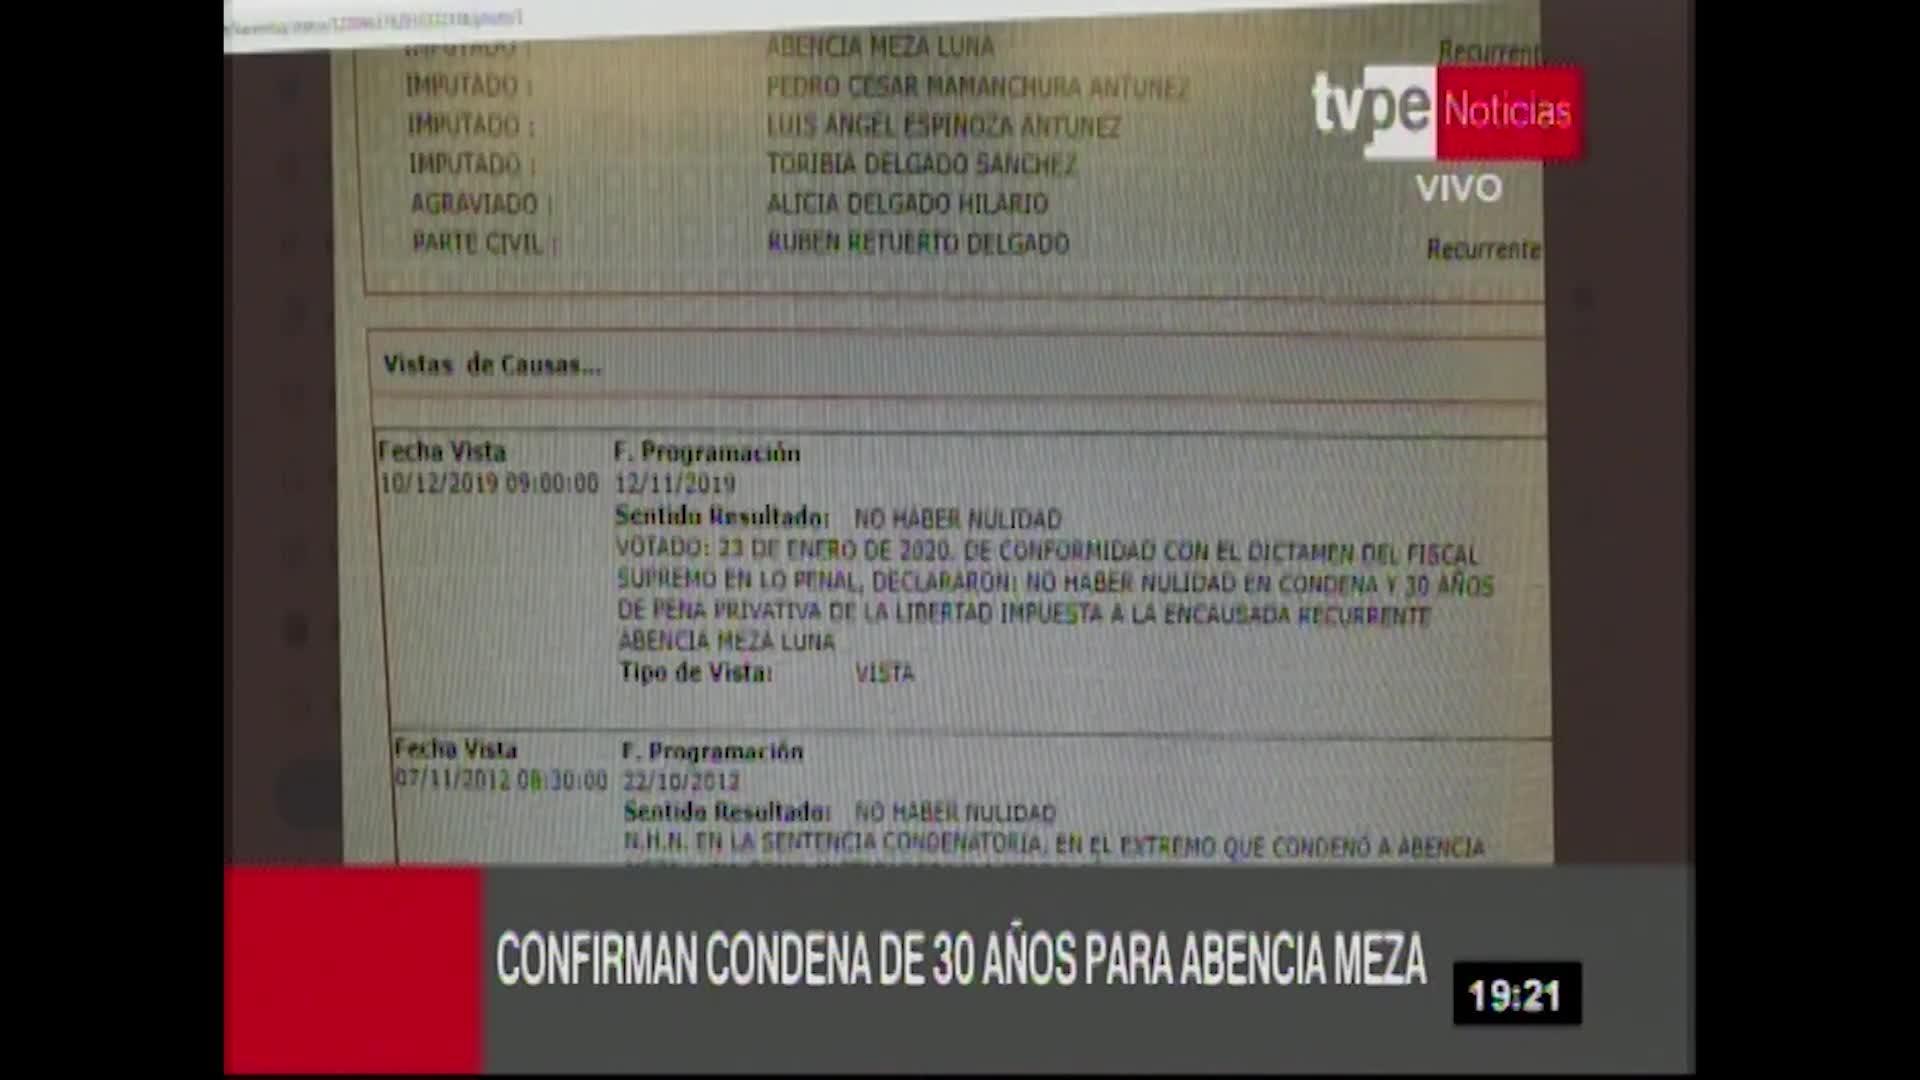 Confirman sentencia de 30 años contra Abencia Meza por crimen de Alicia Delgado